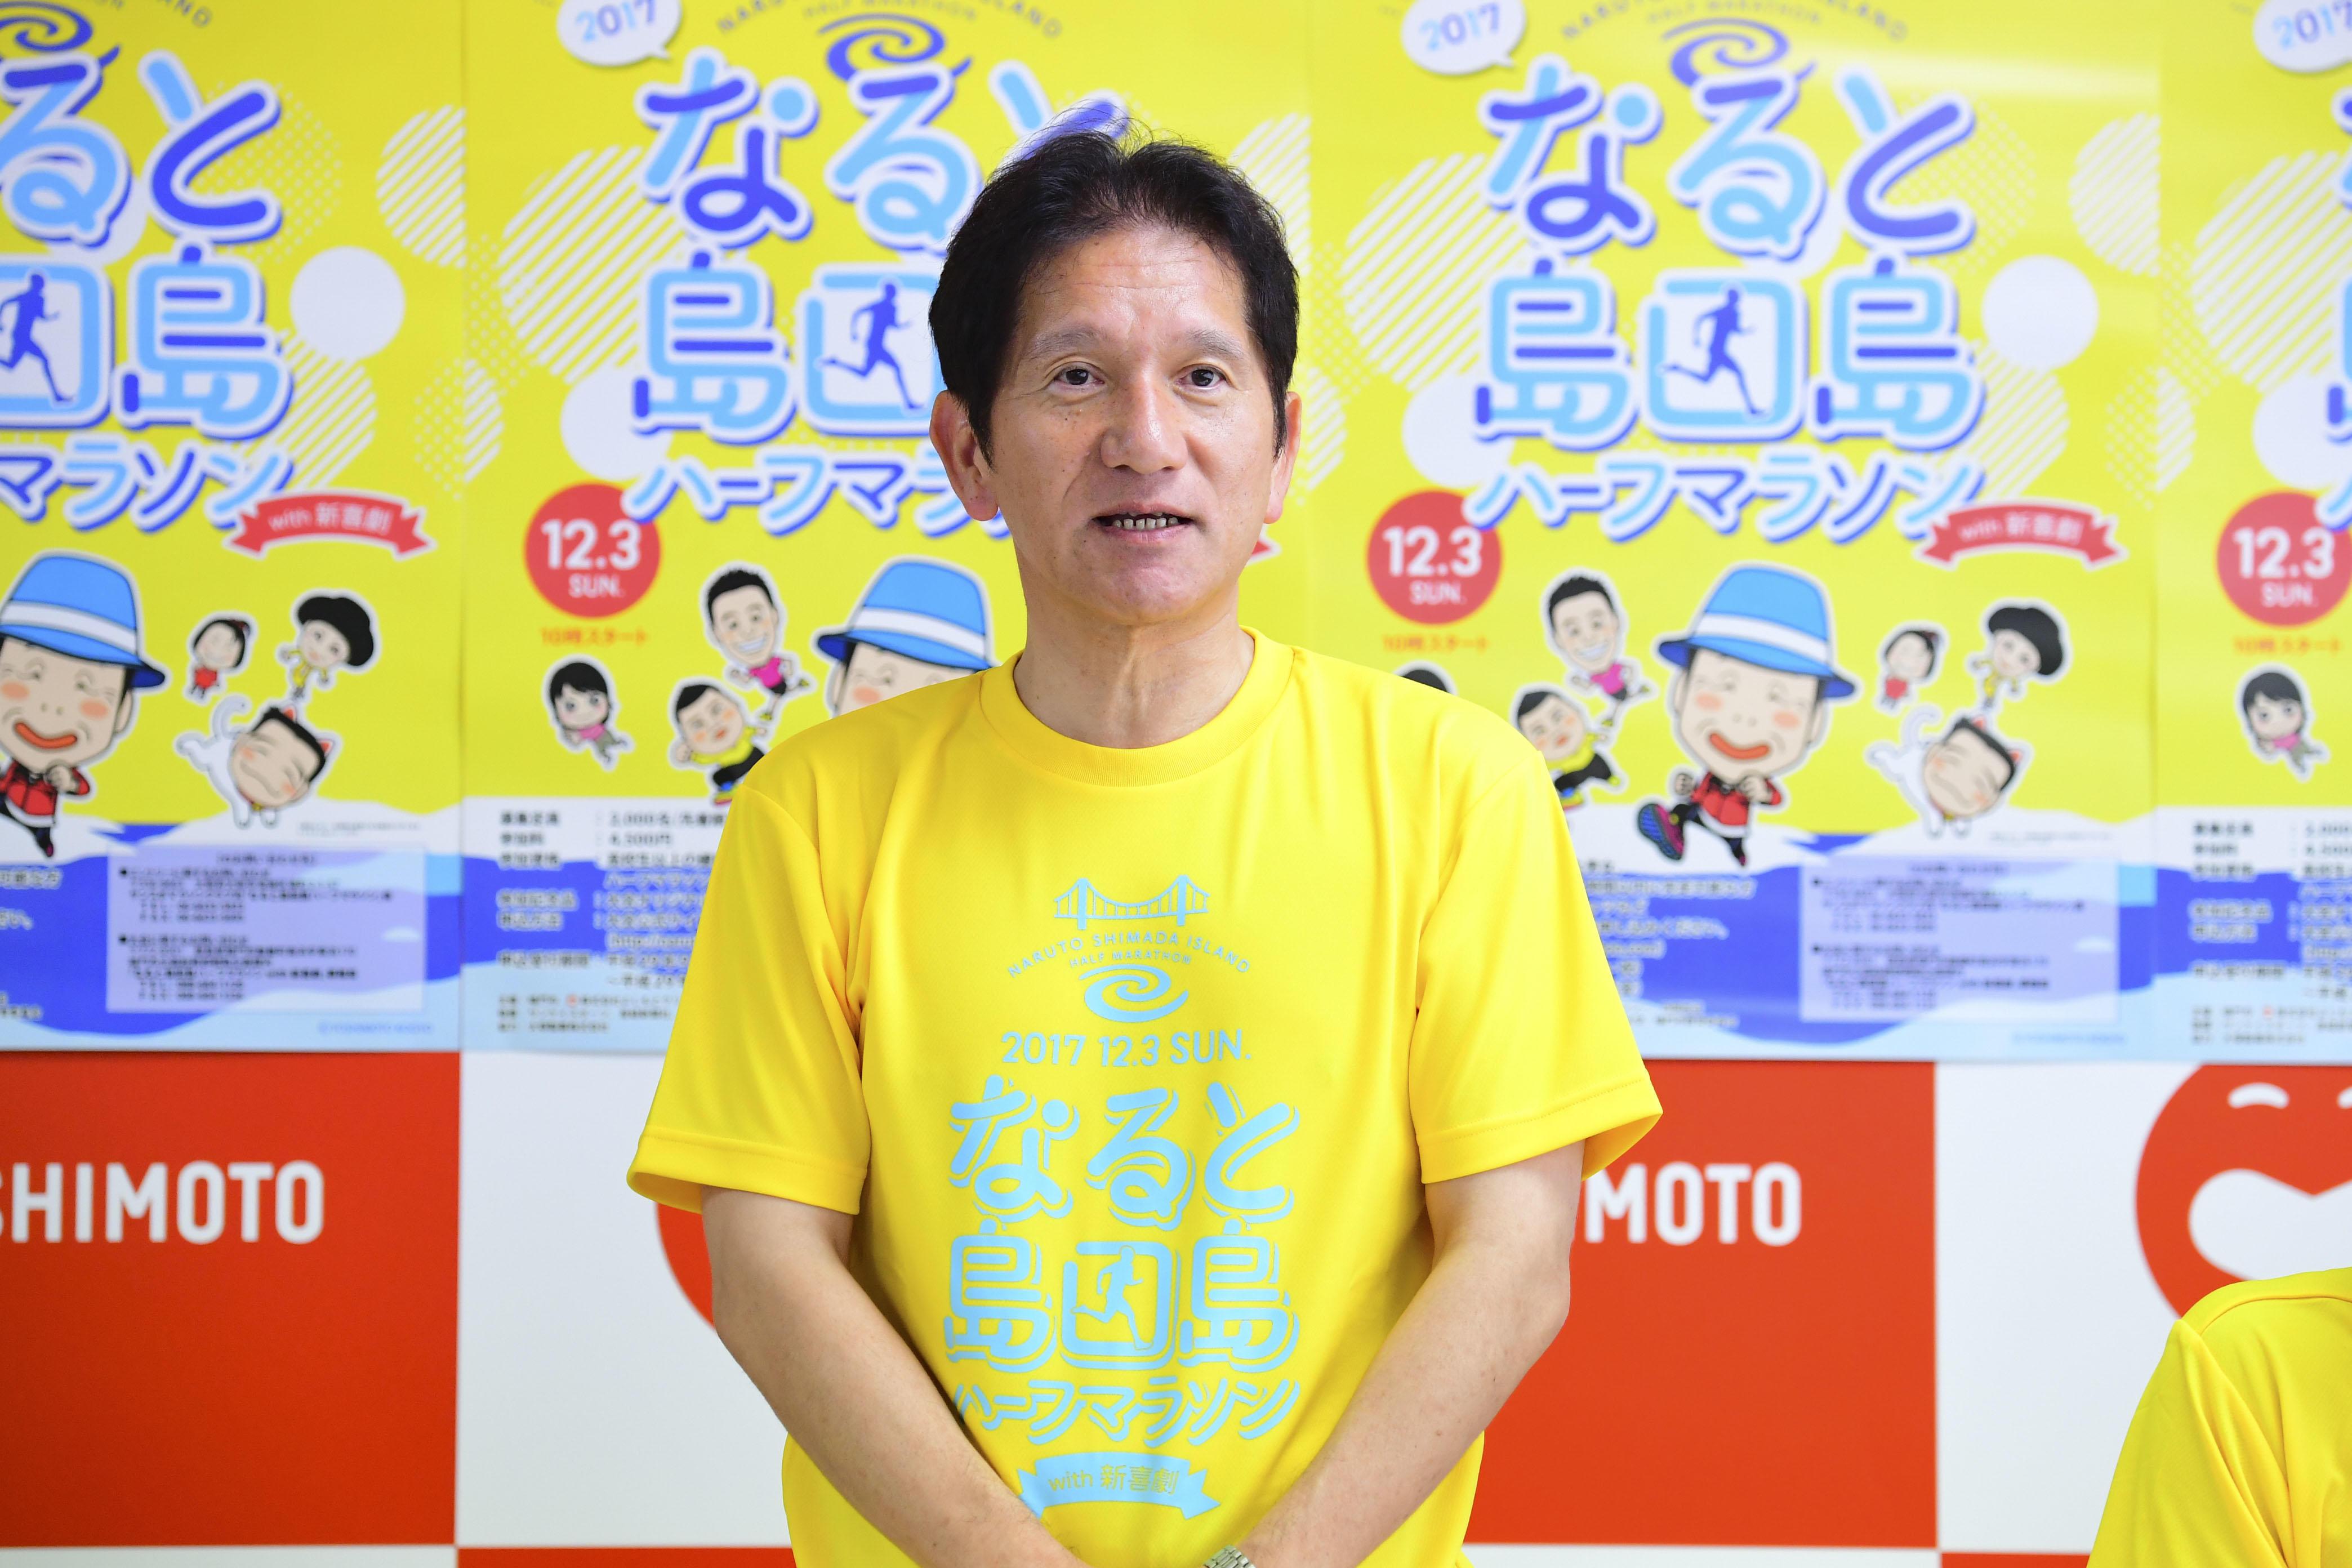 http://news.yoshimoto.co.jp/20170911181558-d85a313cff6b2741d52057d41fc6a9a416a86ad7.jpg